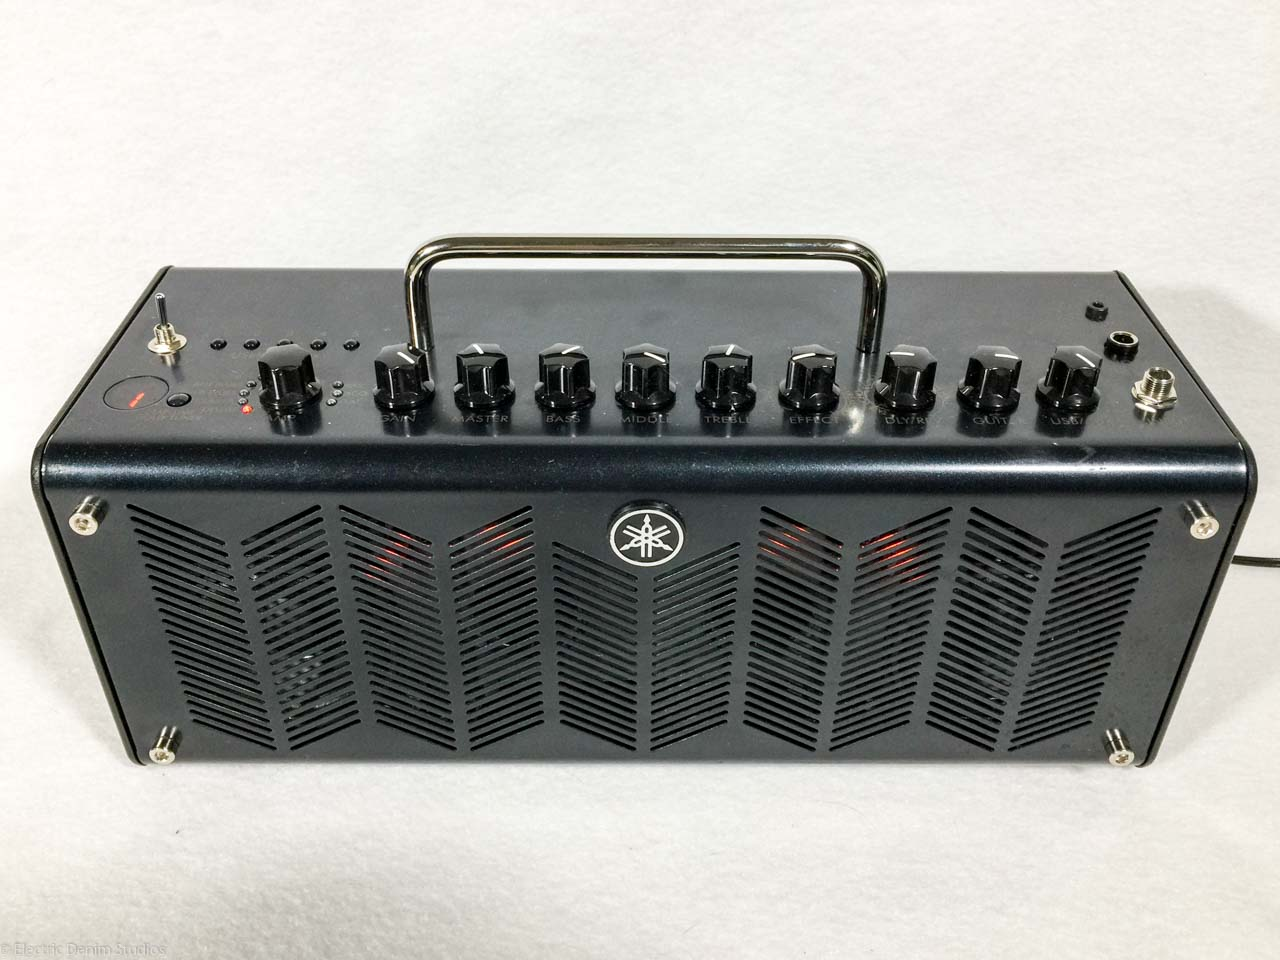 Yamaha thr10c 10 watt desktop modeling amp electric for Yamaha bass guitar amplifier